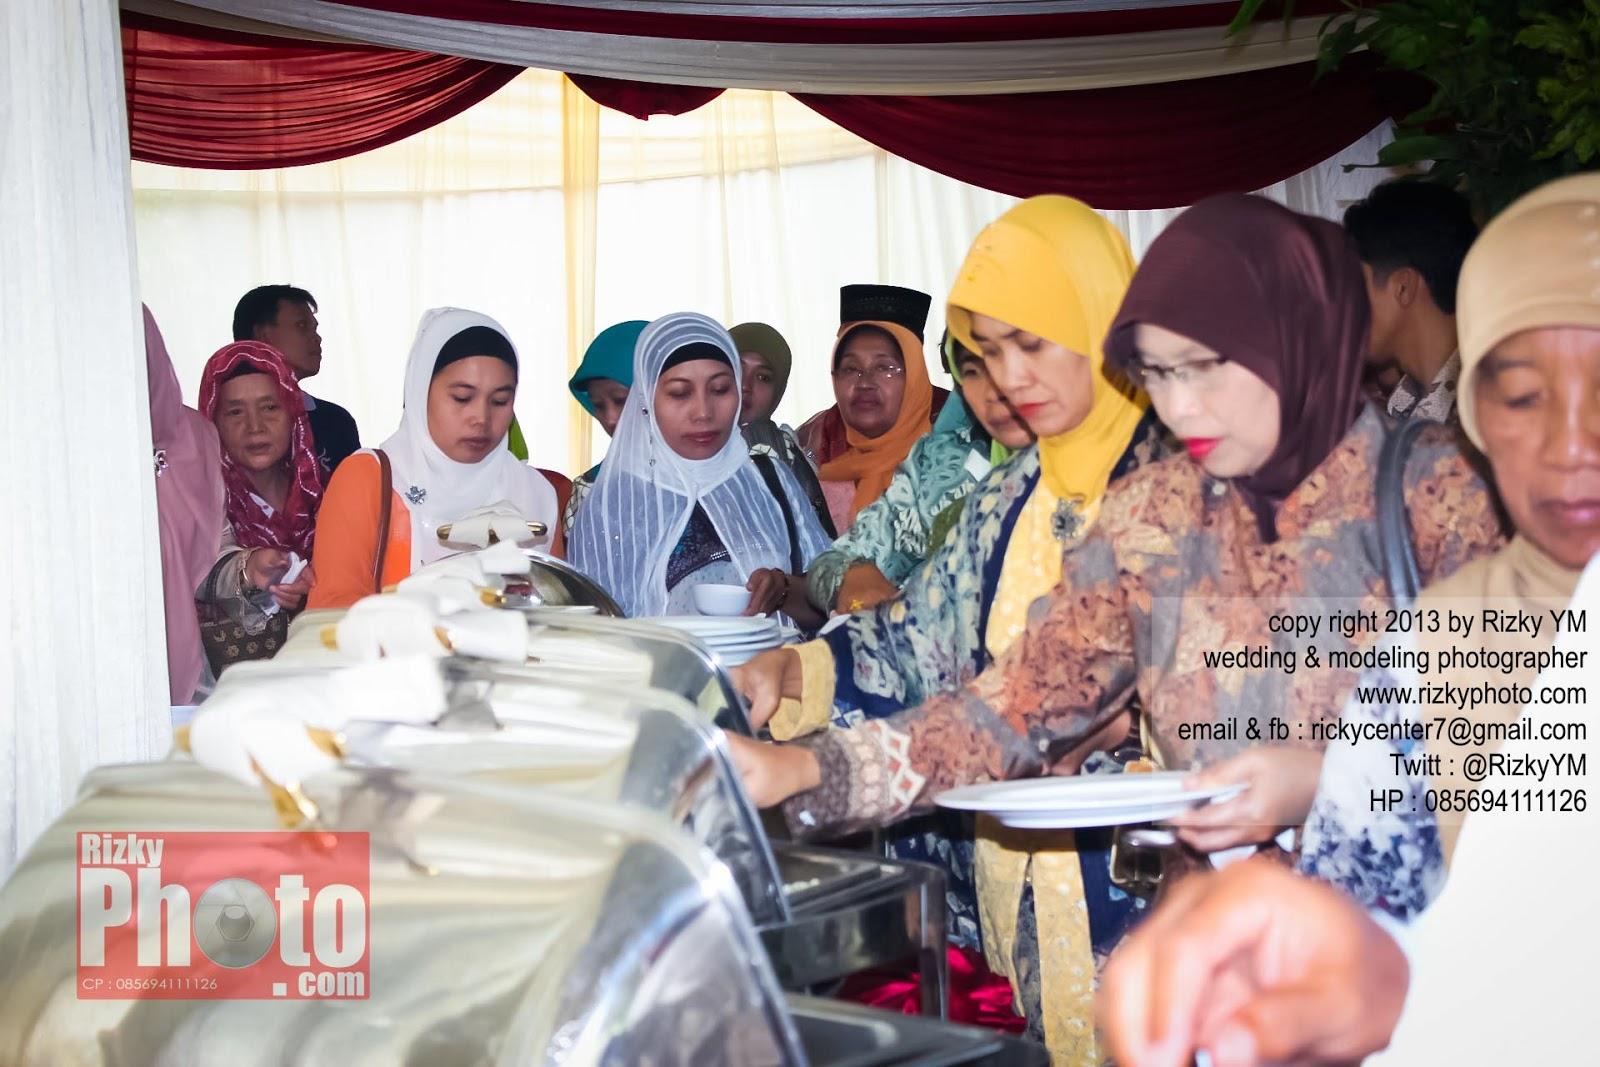 Lihat Fotografer Surabaya Prewedding Dokumentasi Wedding: Fotografer Freelance Surabaya